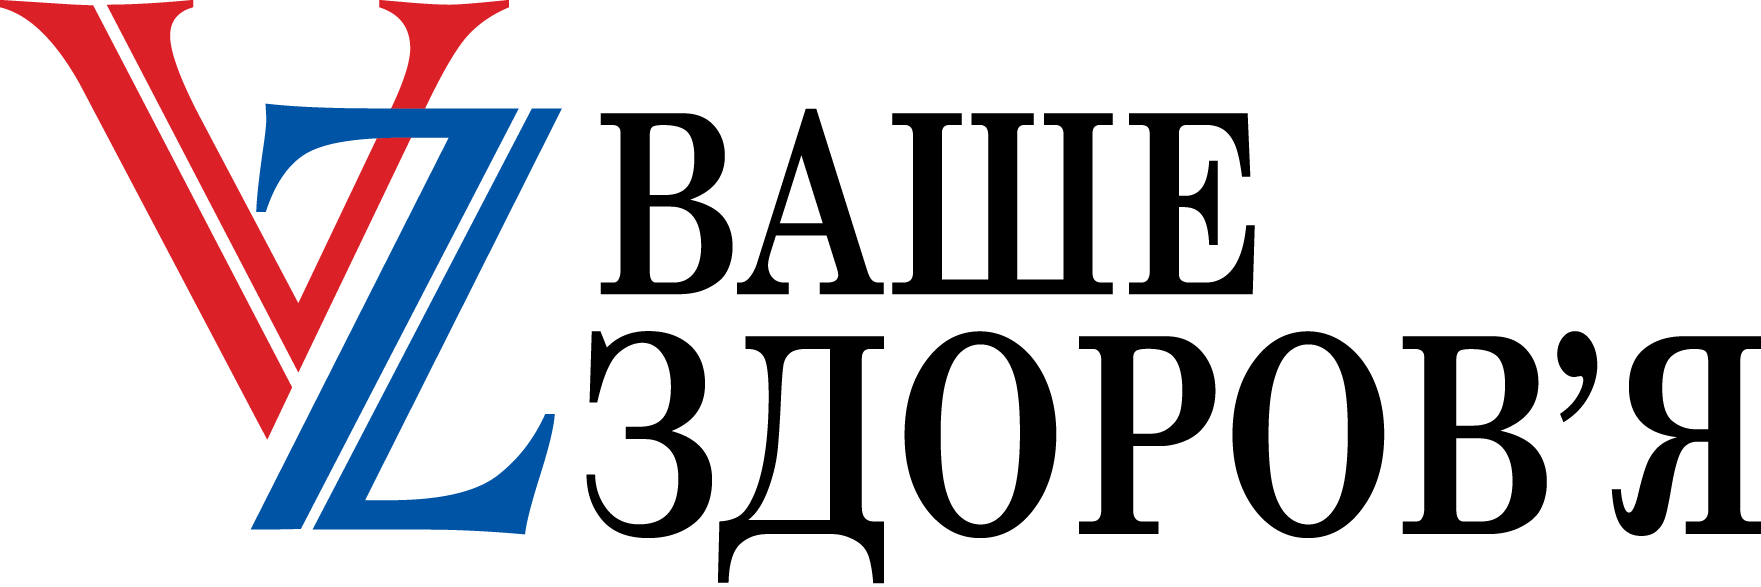 logo_VZ-ret